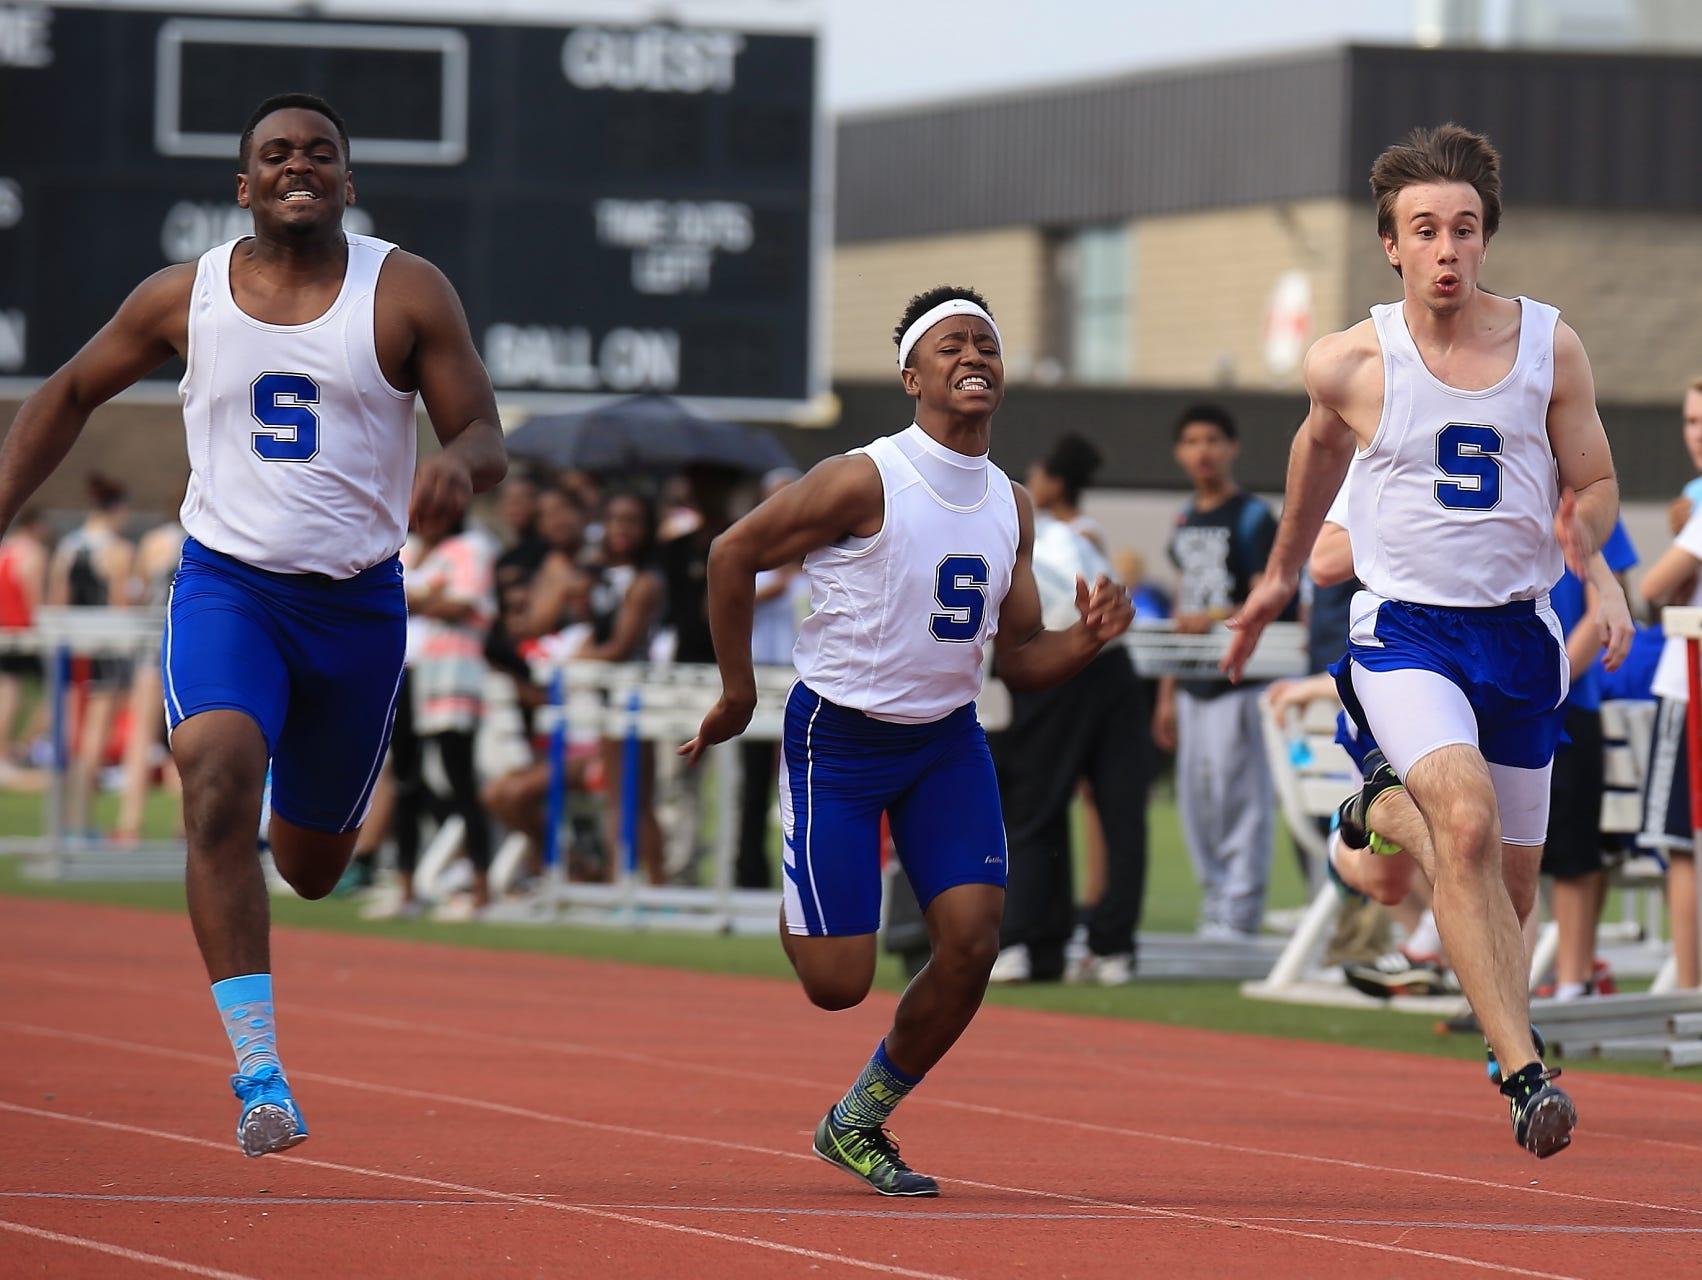 Salem's varsity boys track team continues to excel.